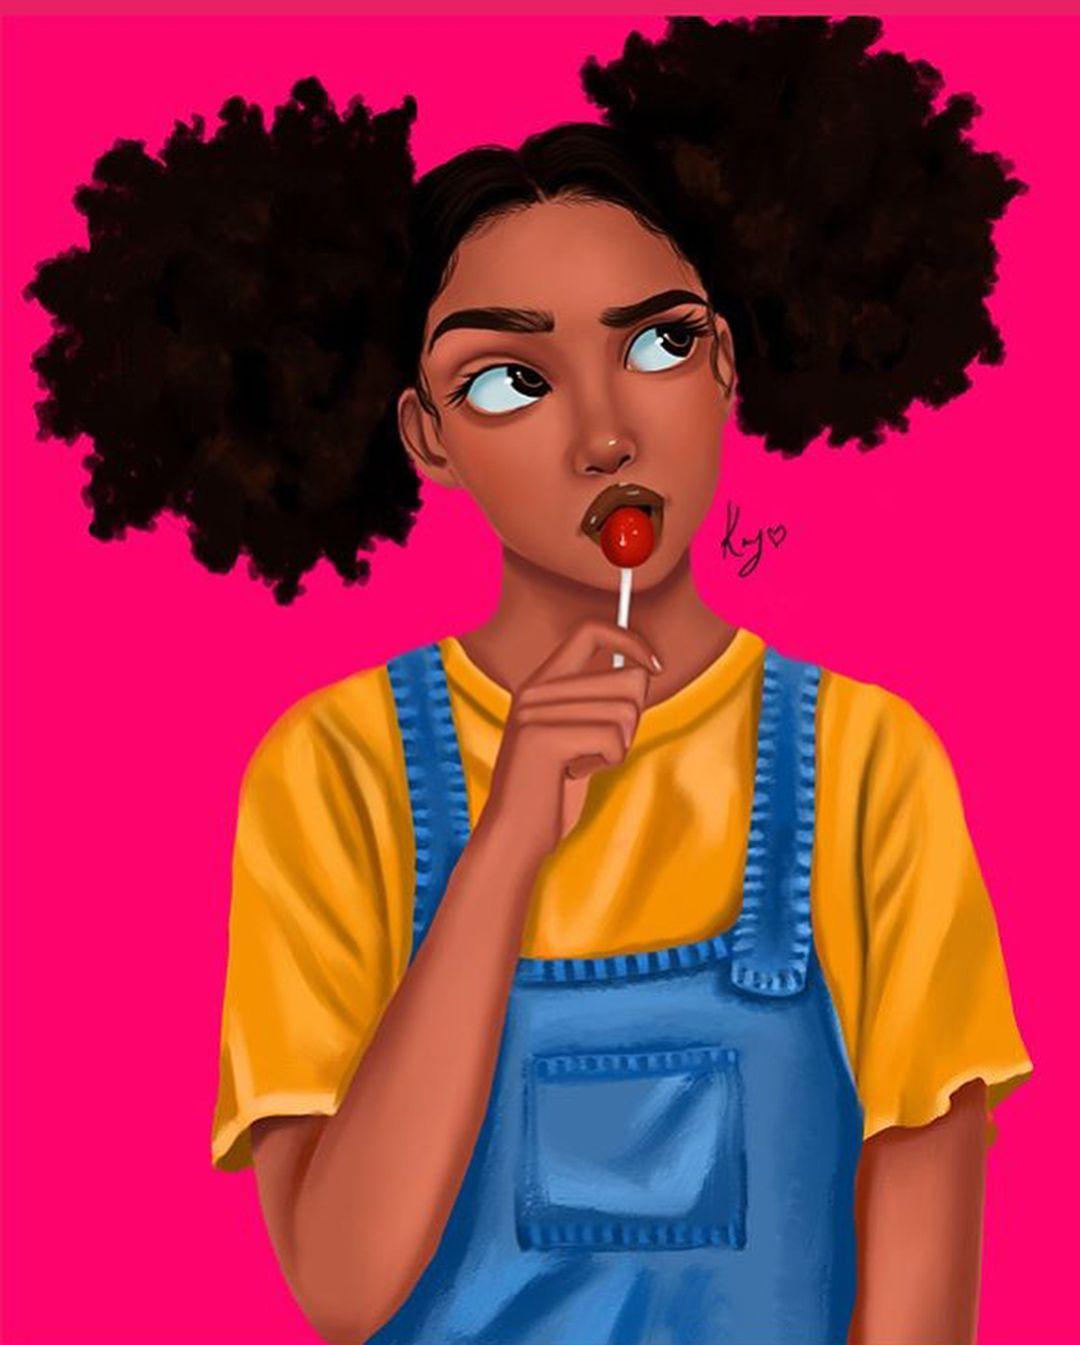 Art princess__kay_ melaningram black girl magic art